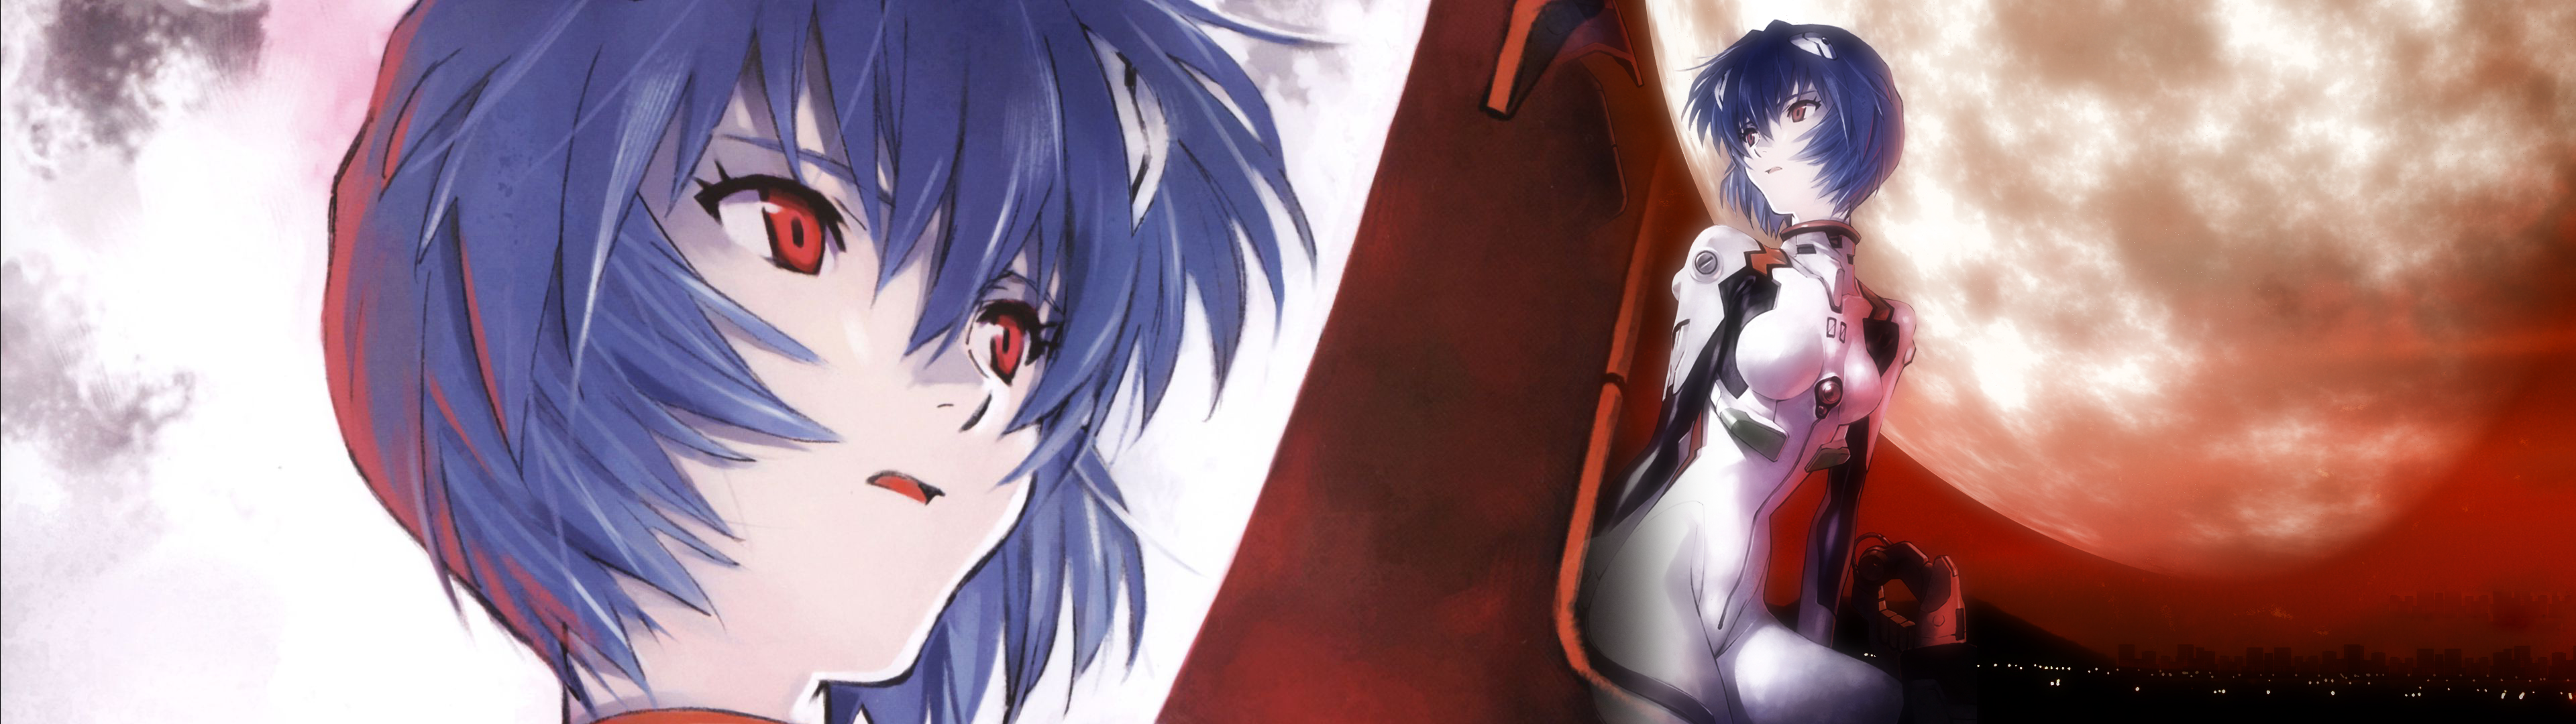 Neon Genesis Evangelion HD Wallpaper   Background Image ...